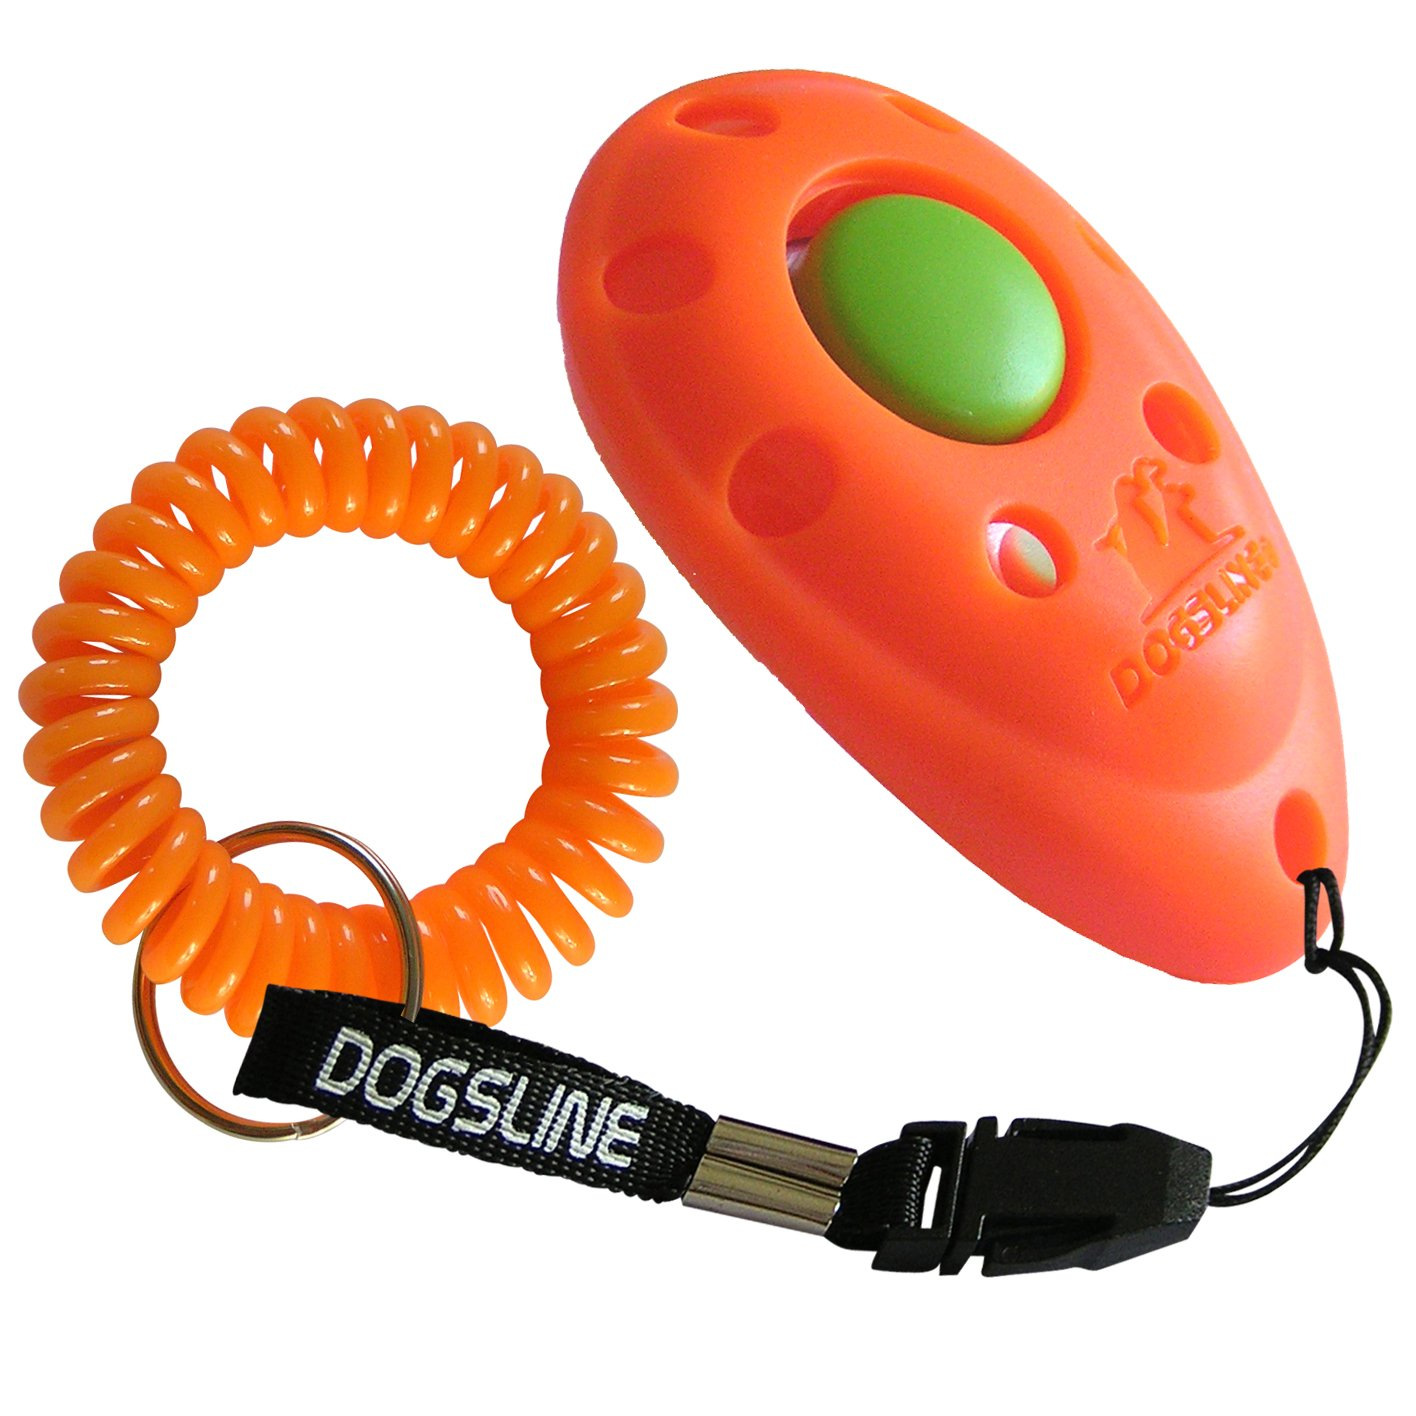 DOGSLINE Profi Clicker mit Spiralarmband für Clickertraining, Hundeschulen Premium Klicker product image